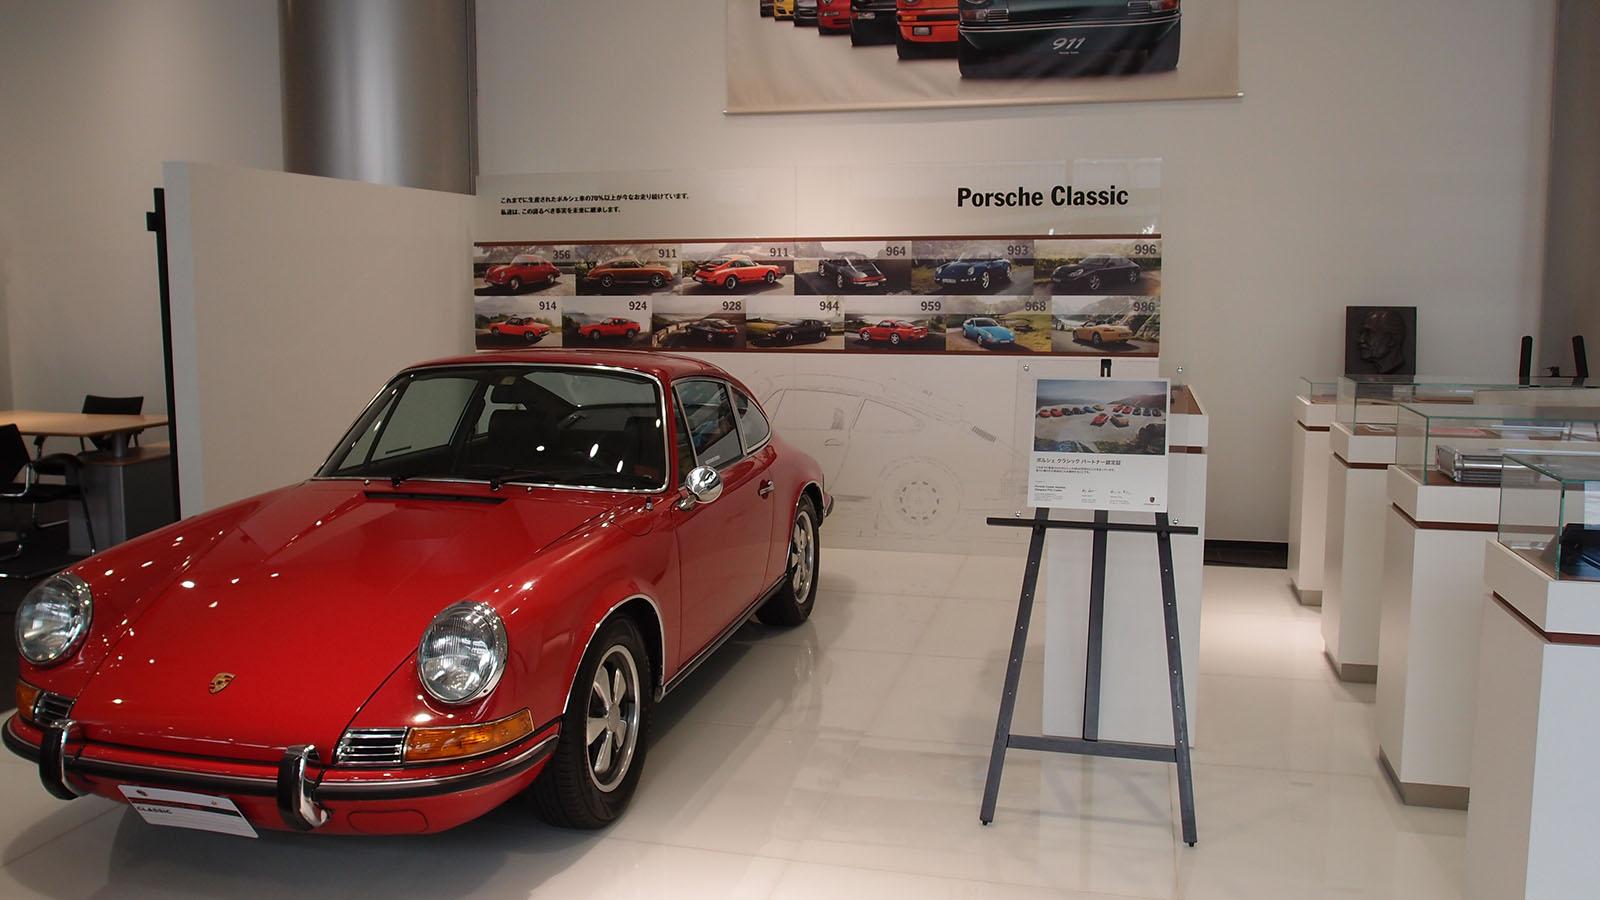 Porsche - Порше Центр Аояма-Сэтагая